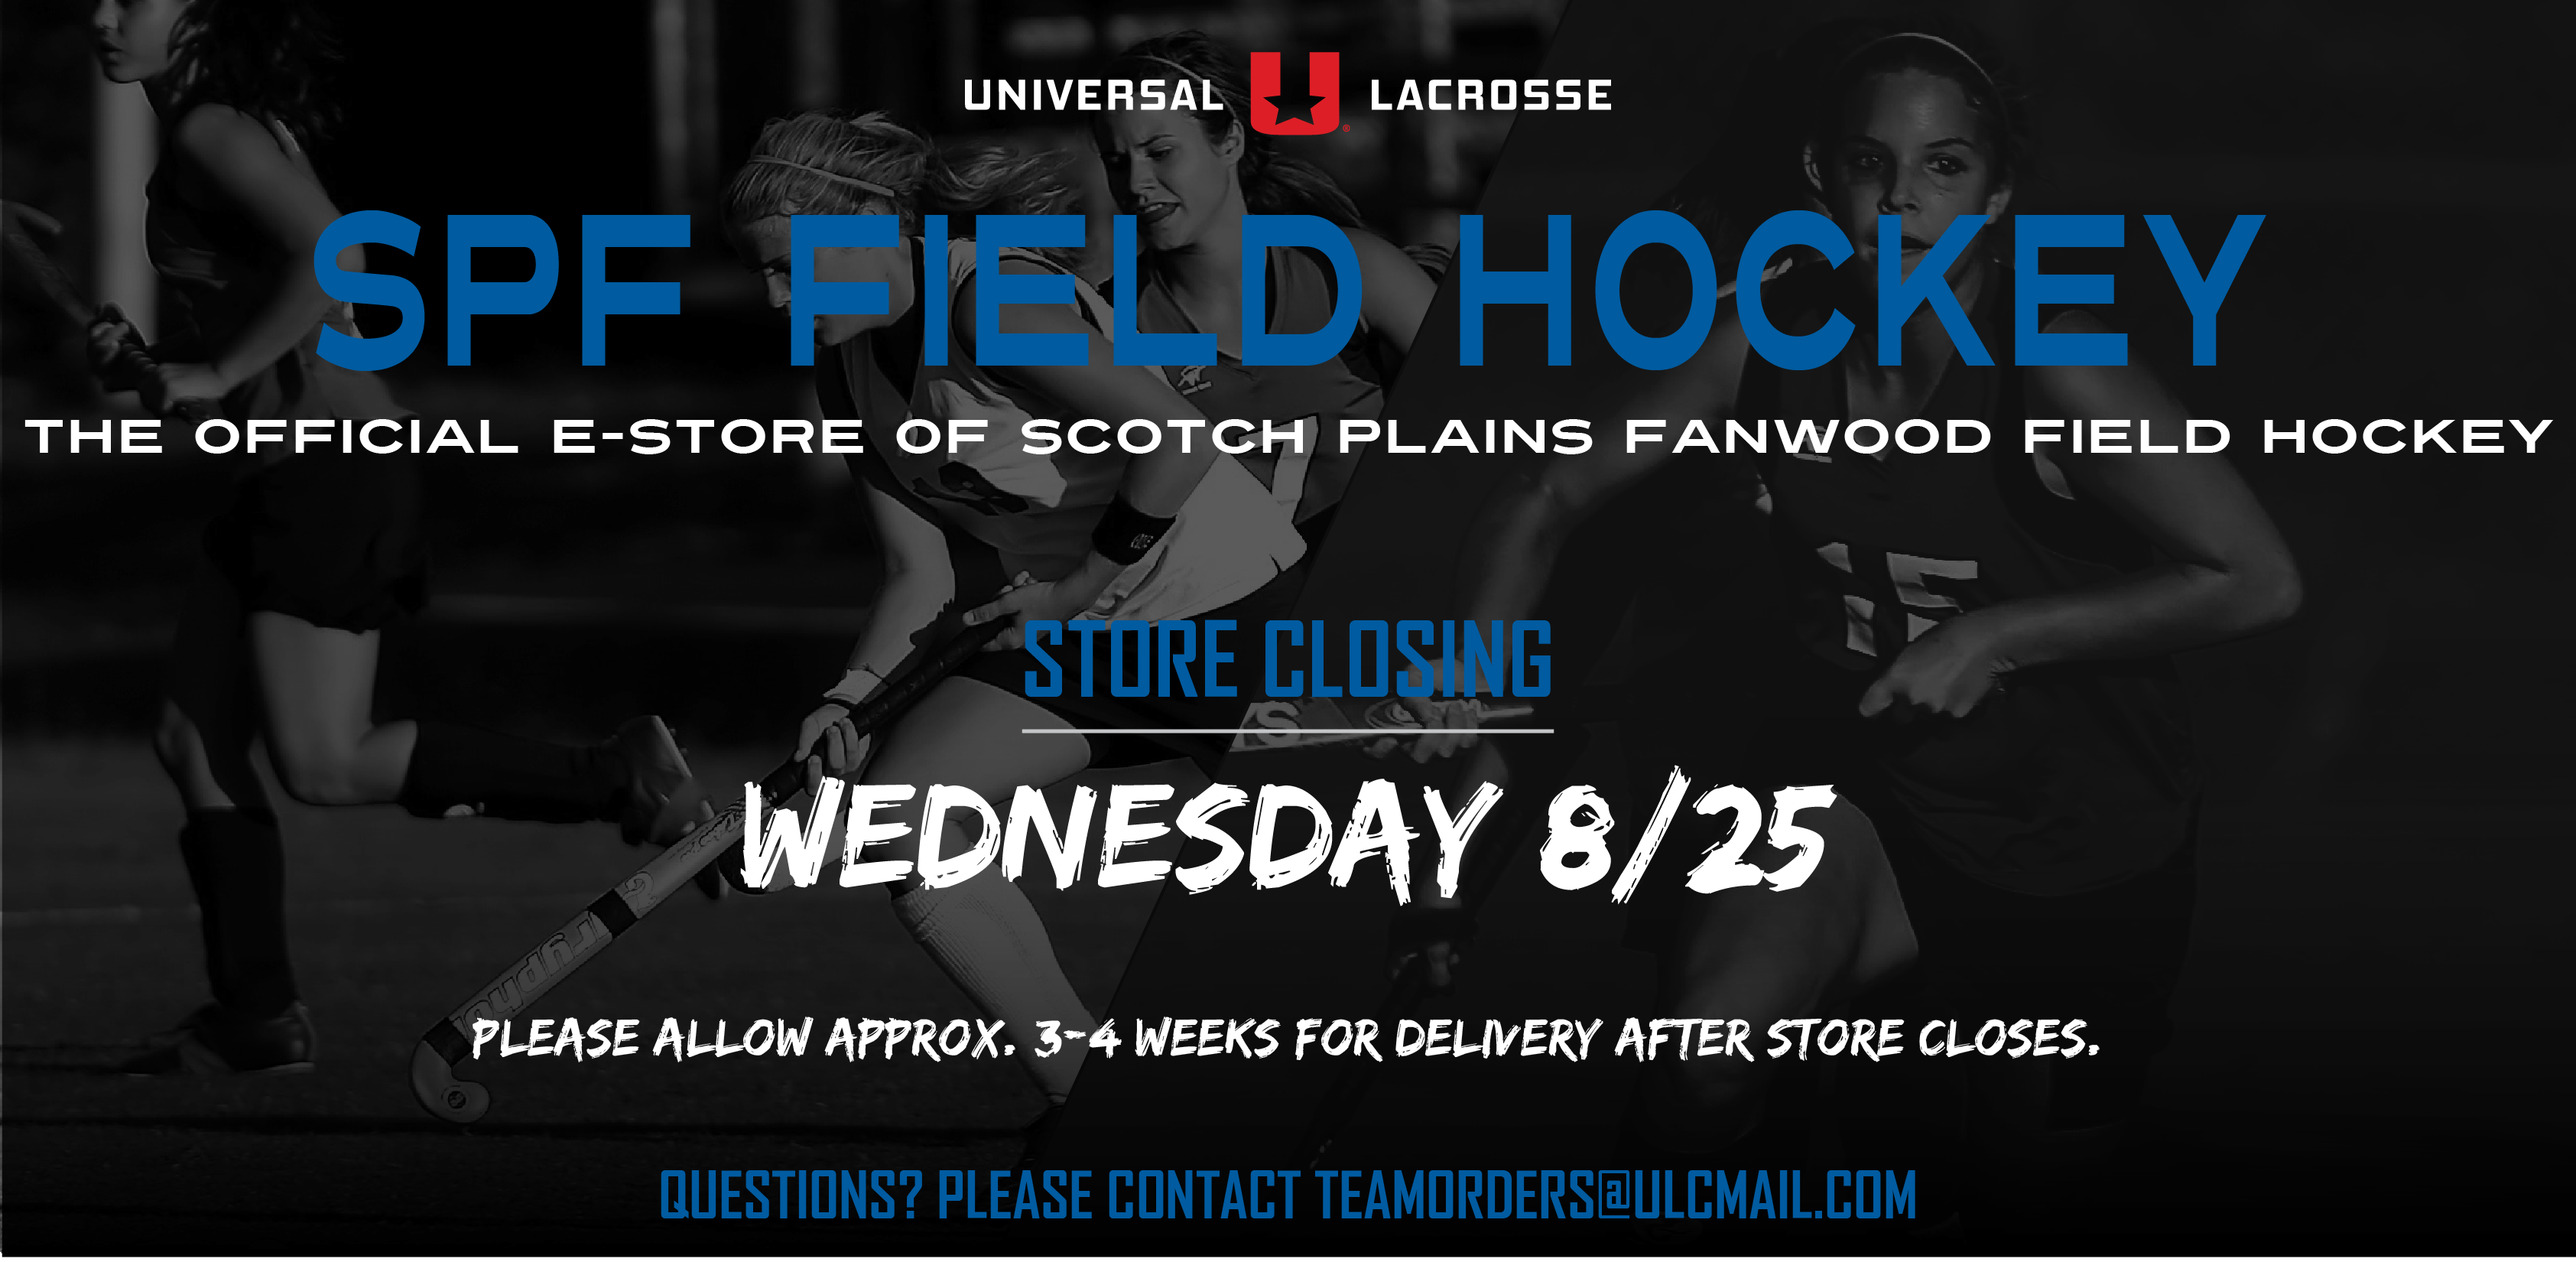 Scotch Plains Fanwood Field Hockey